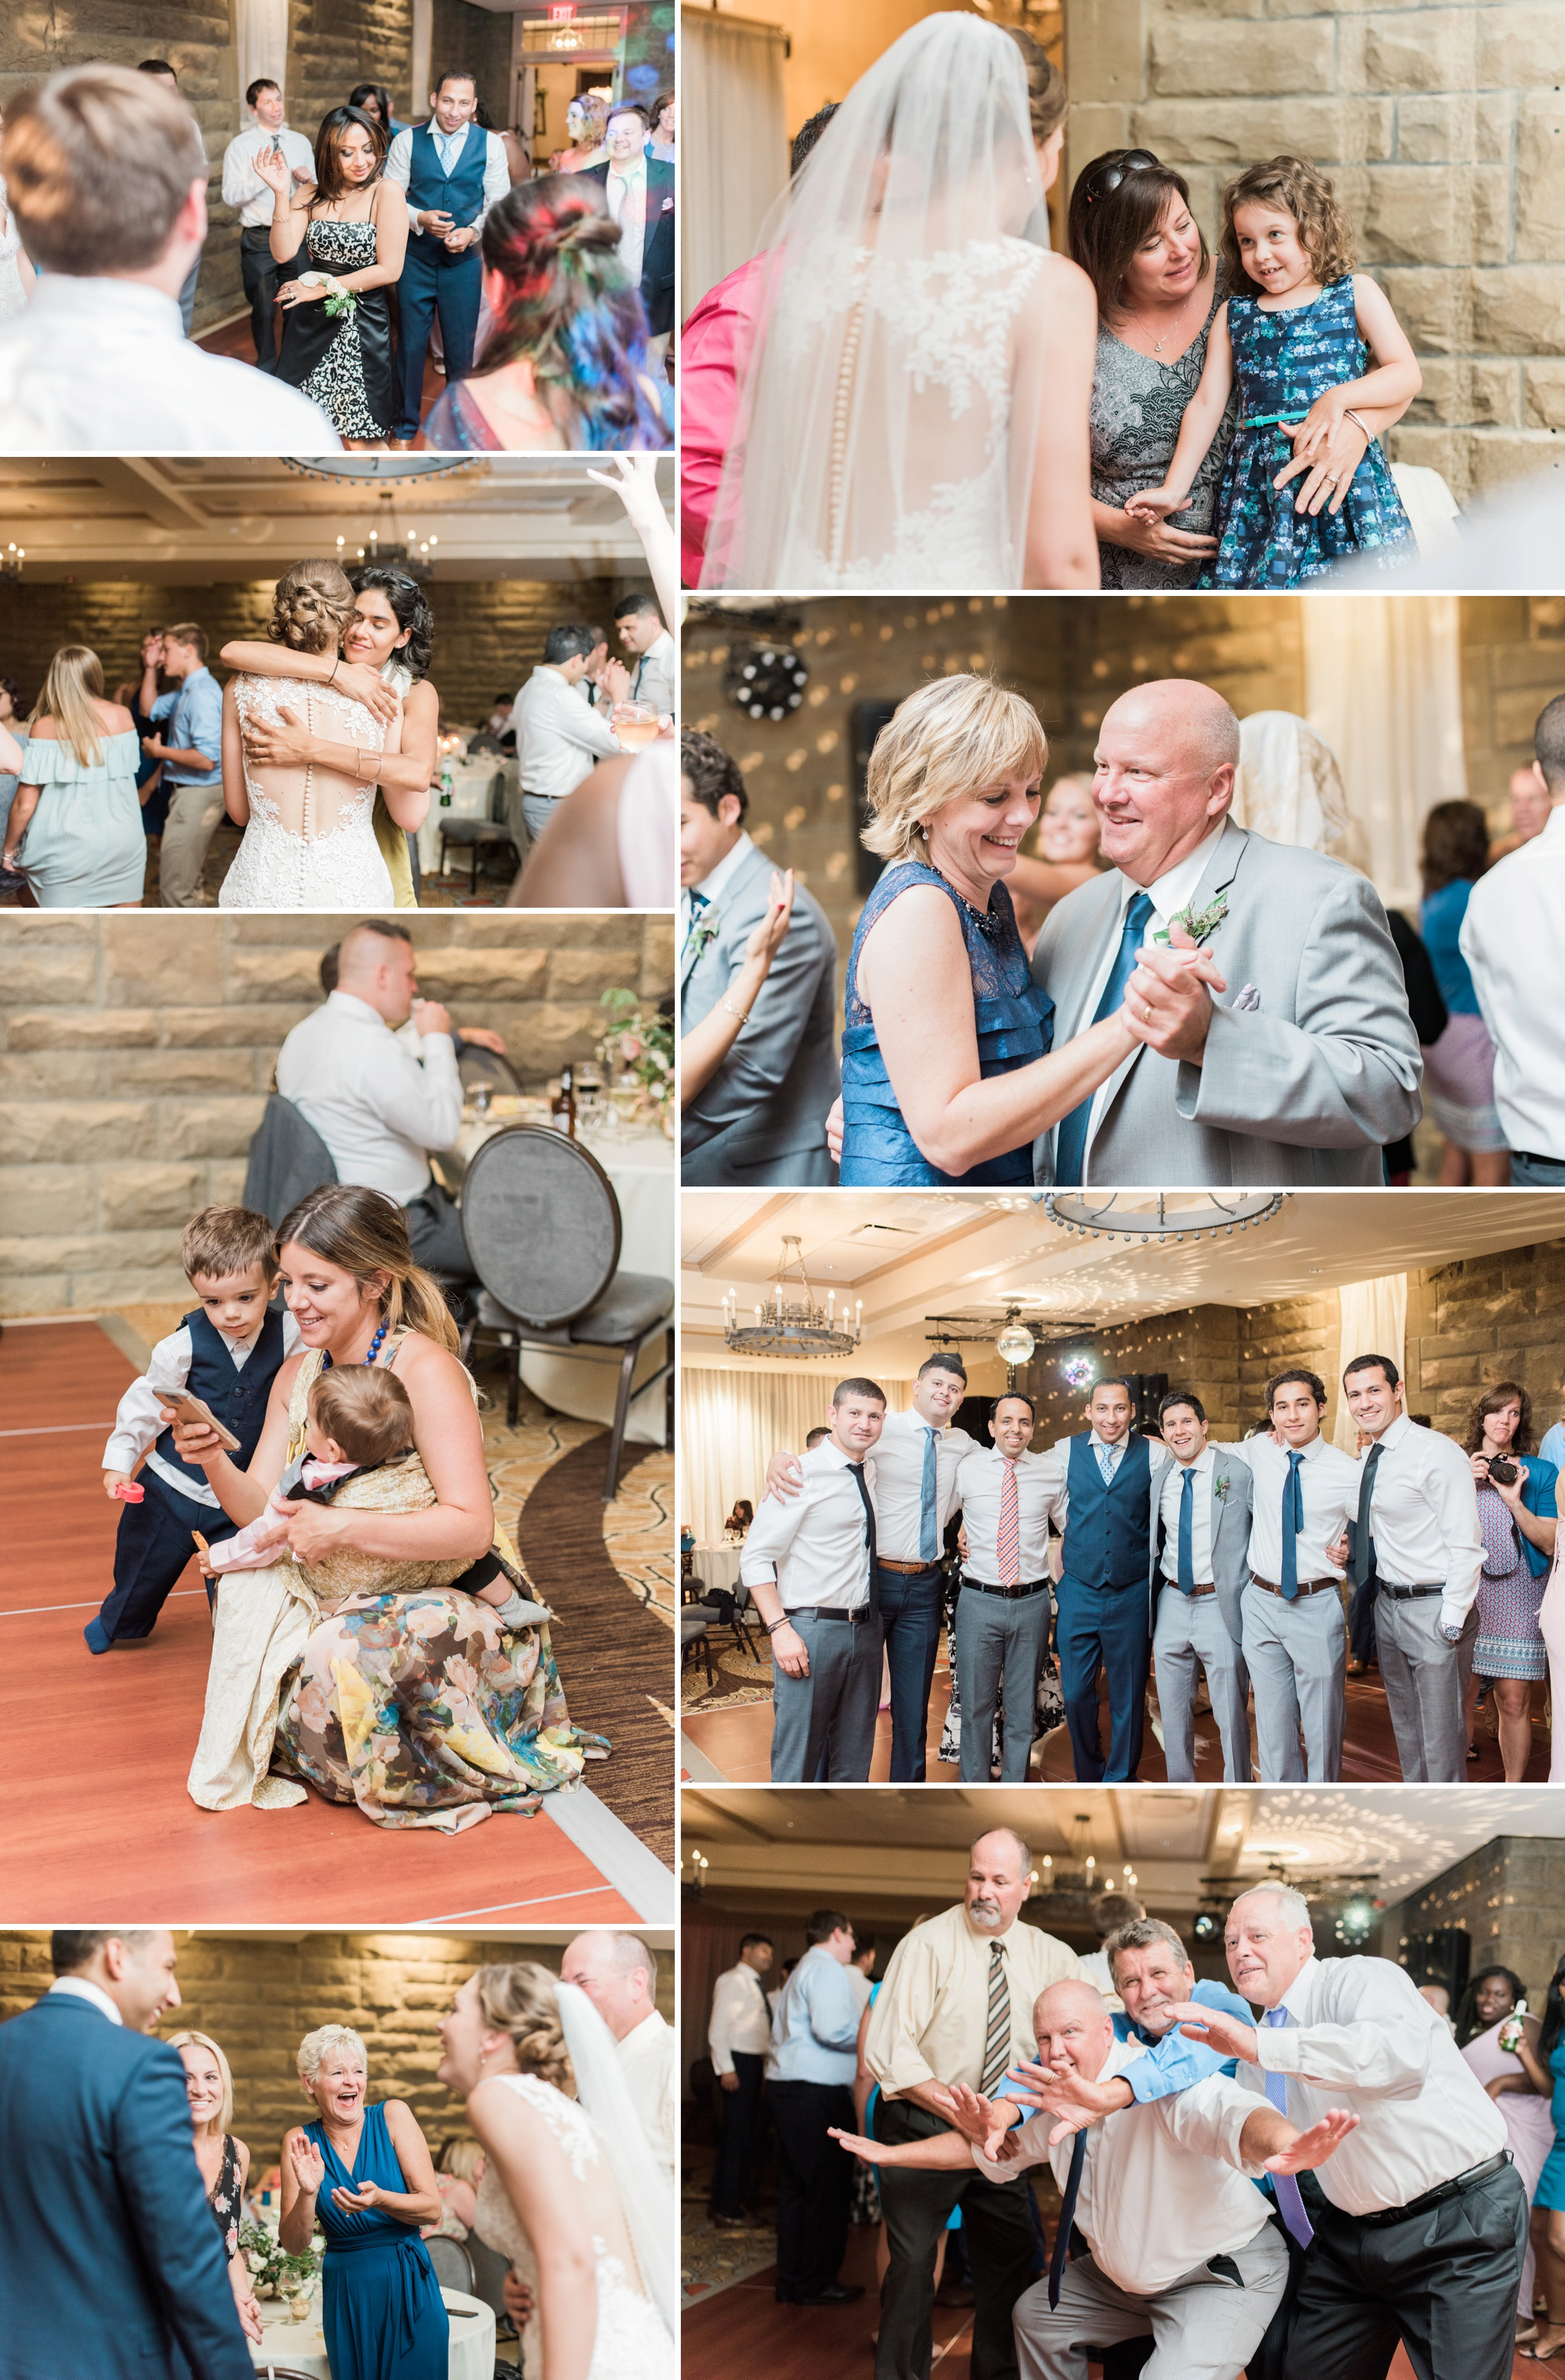 granville-inn-wedding-columbus-ohio-photographer_0112.jpg